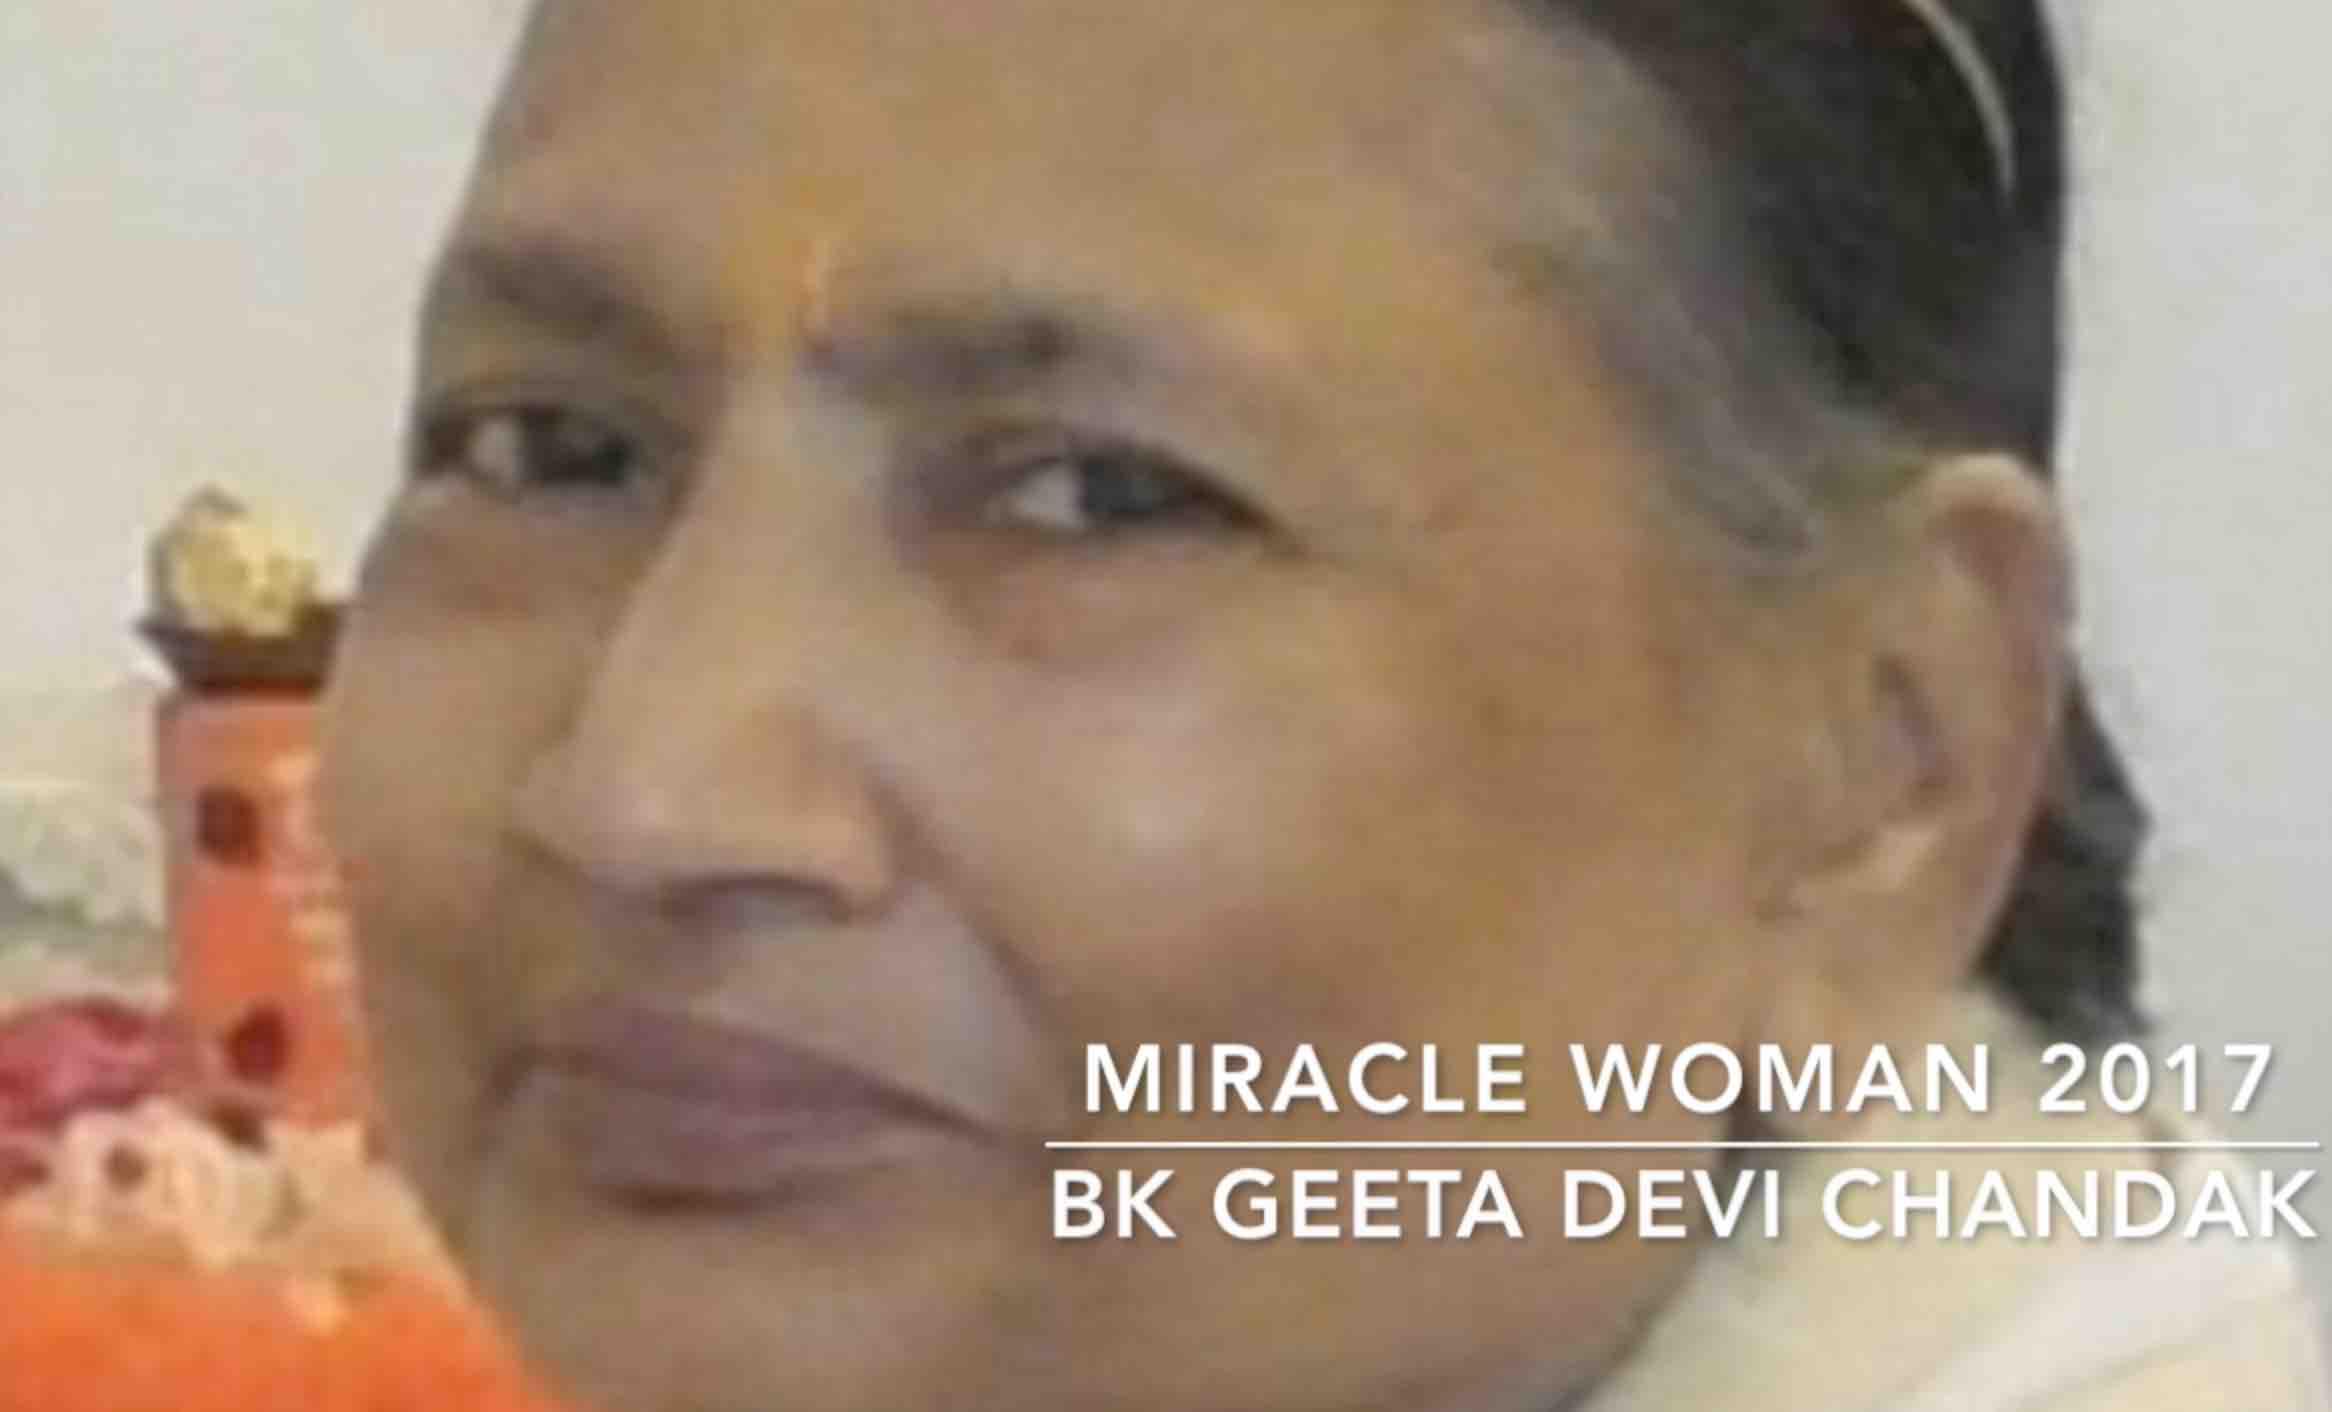 2017 MIRACLE WOMAN